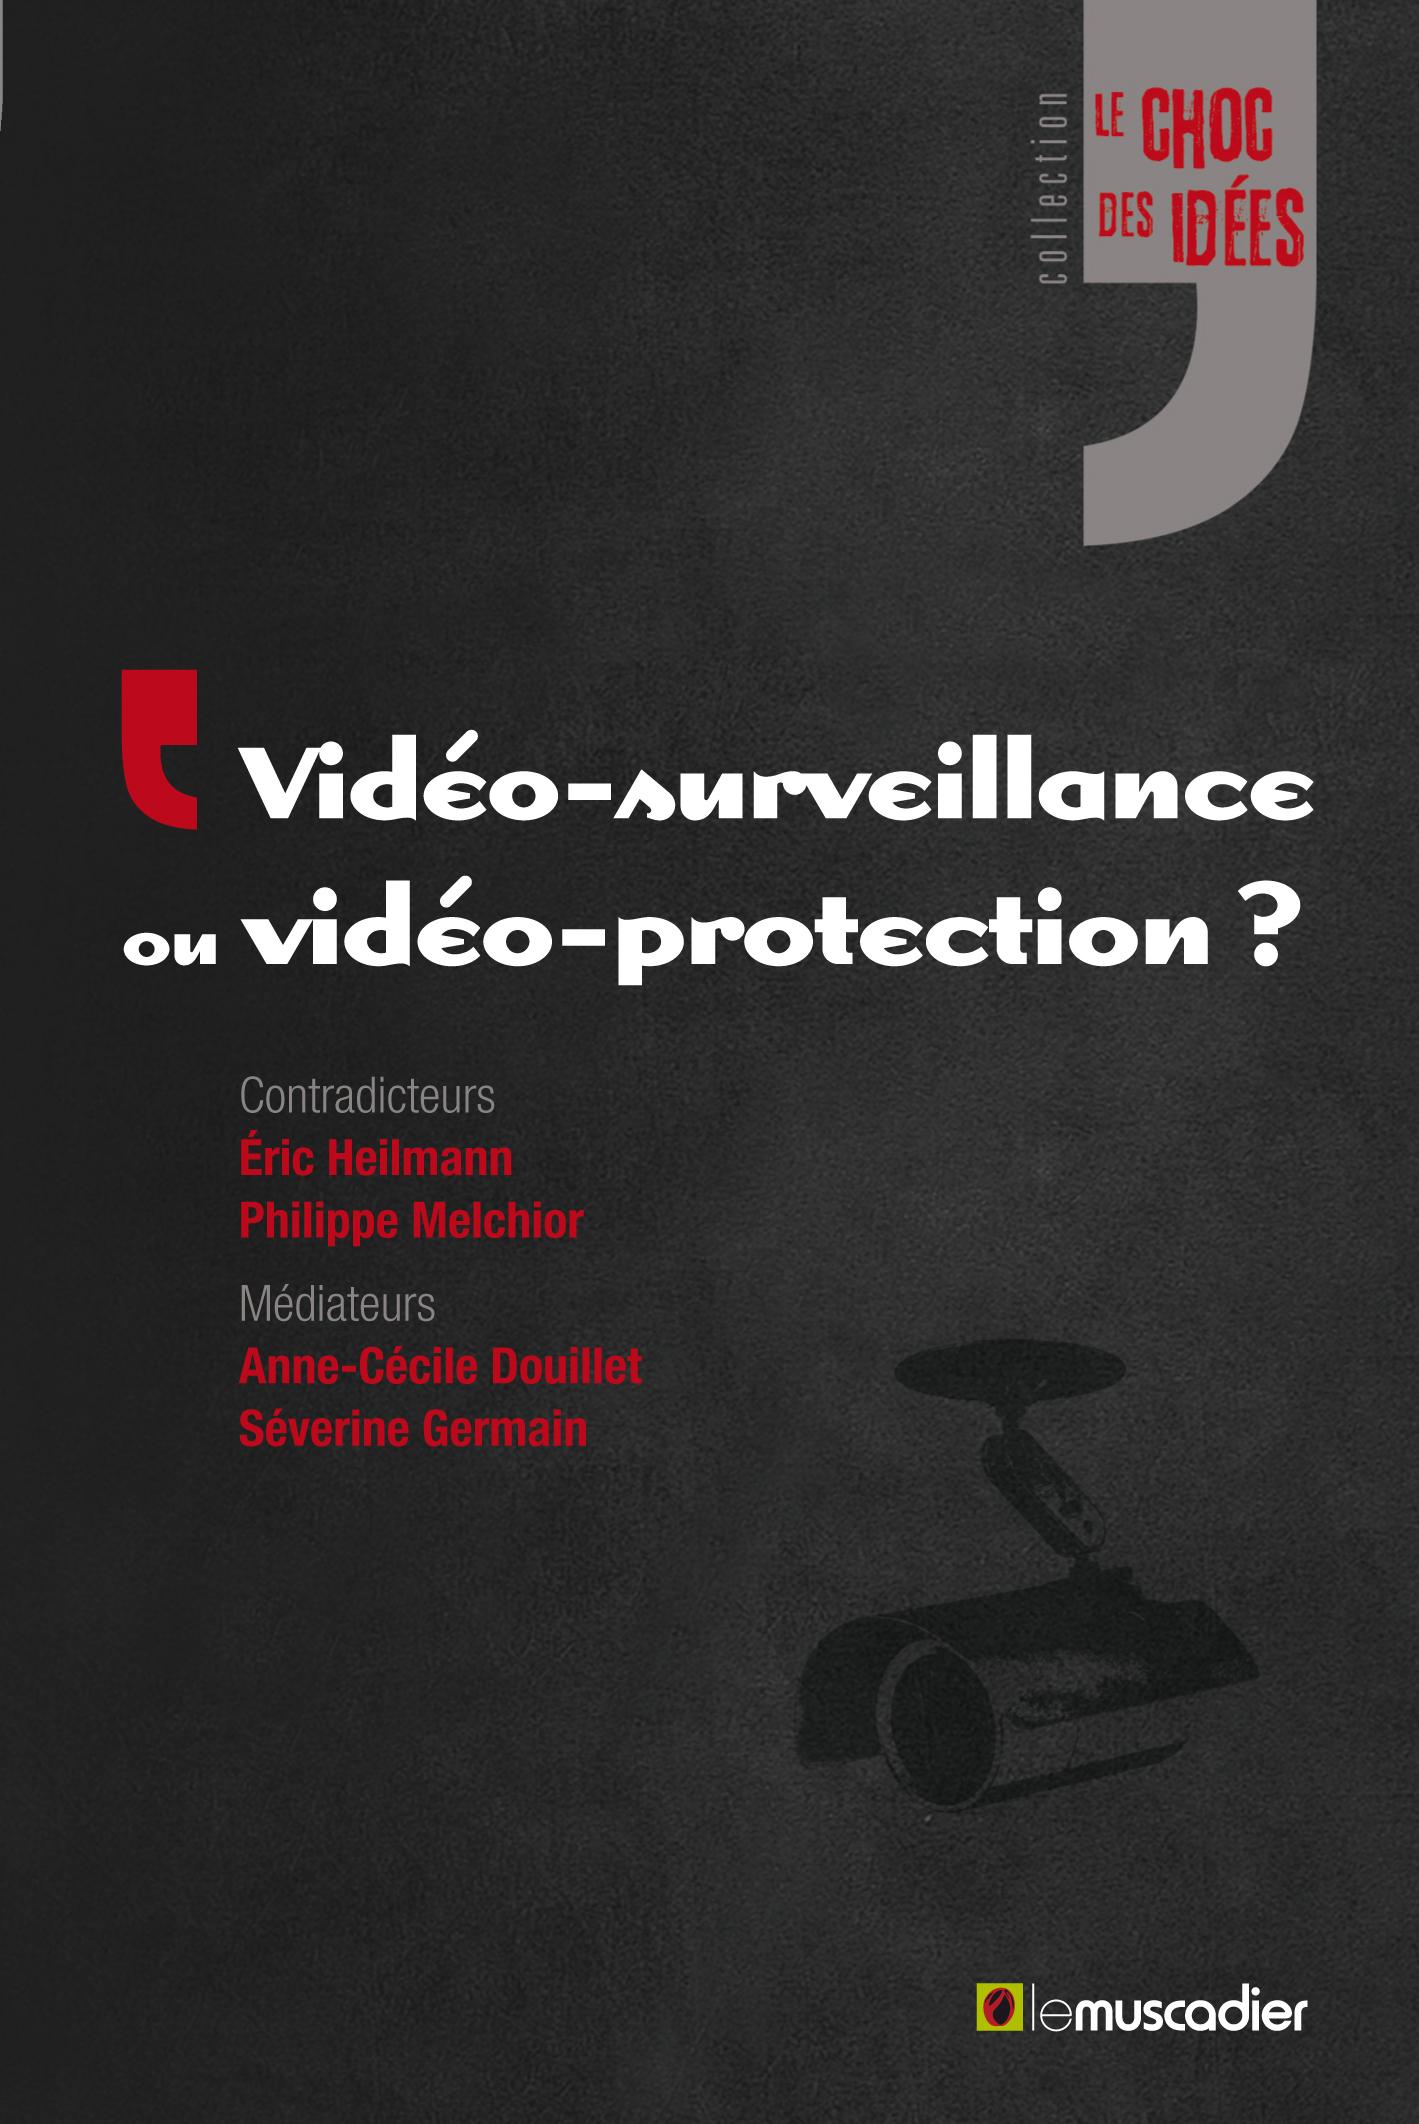 VIDEO-SURVEILLANCE OU VIDEO-PROTECTION ?